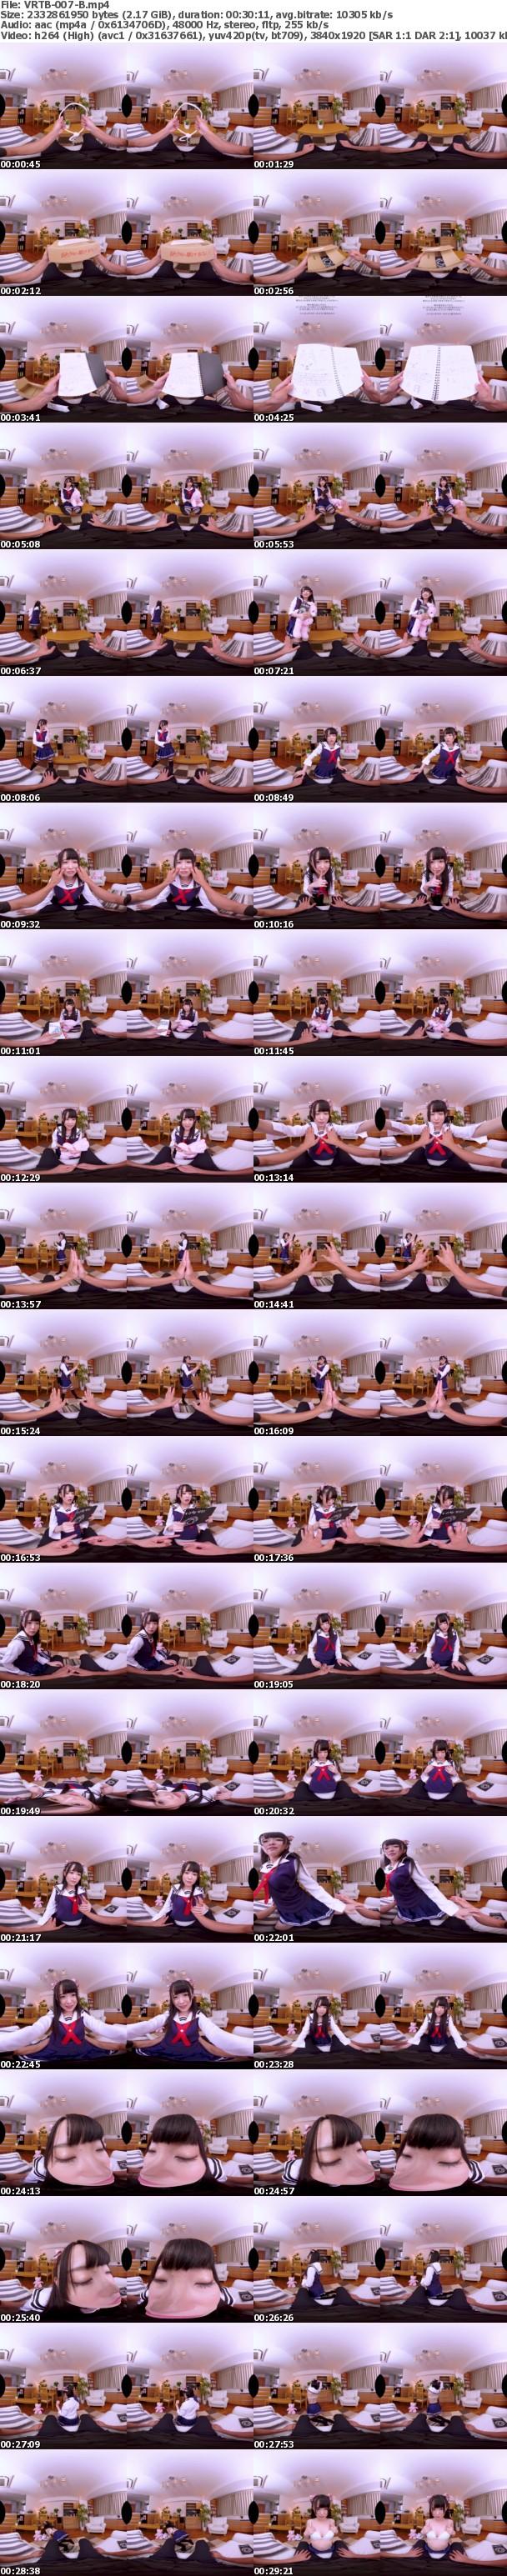 (VR) VRTB-007 THE BEST OF 3DVR 俺の厨二病ノートから理想のカノジョが出てきた件! TWIN PACK(ツインパック) 瀬名きらり 枢木あおい